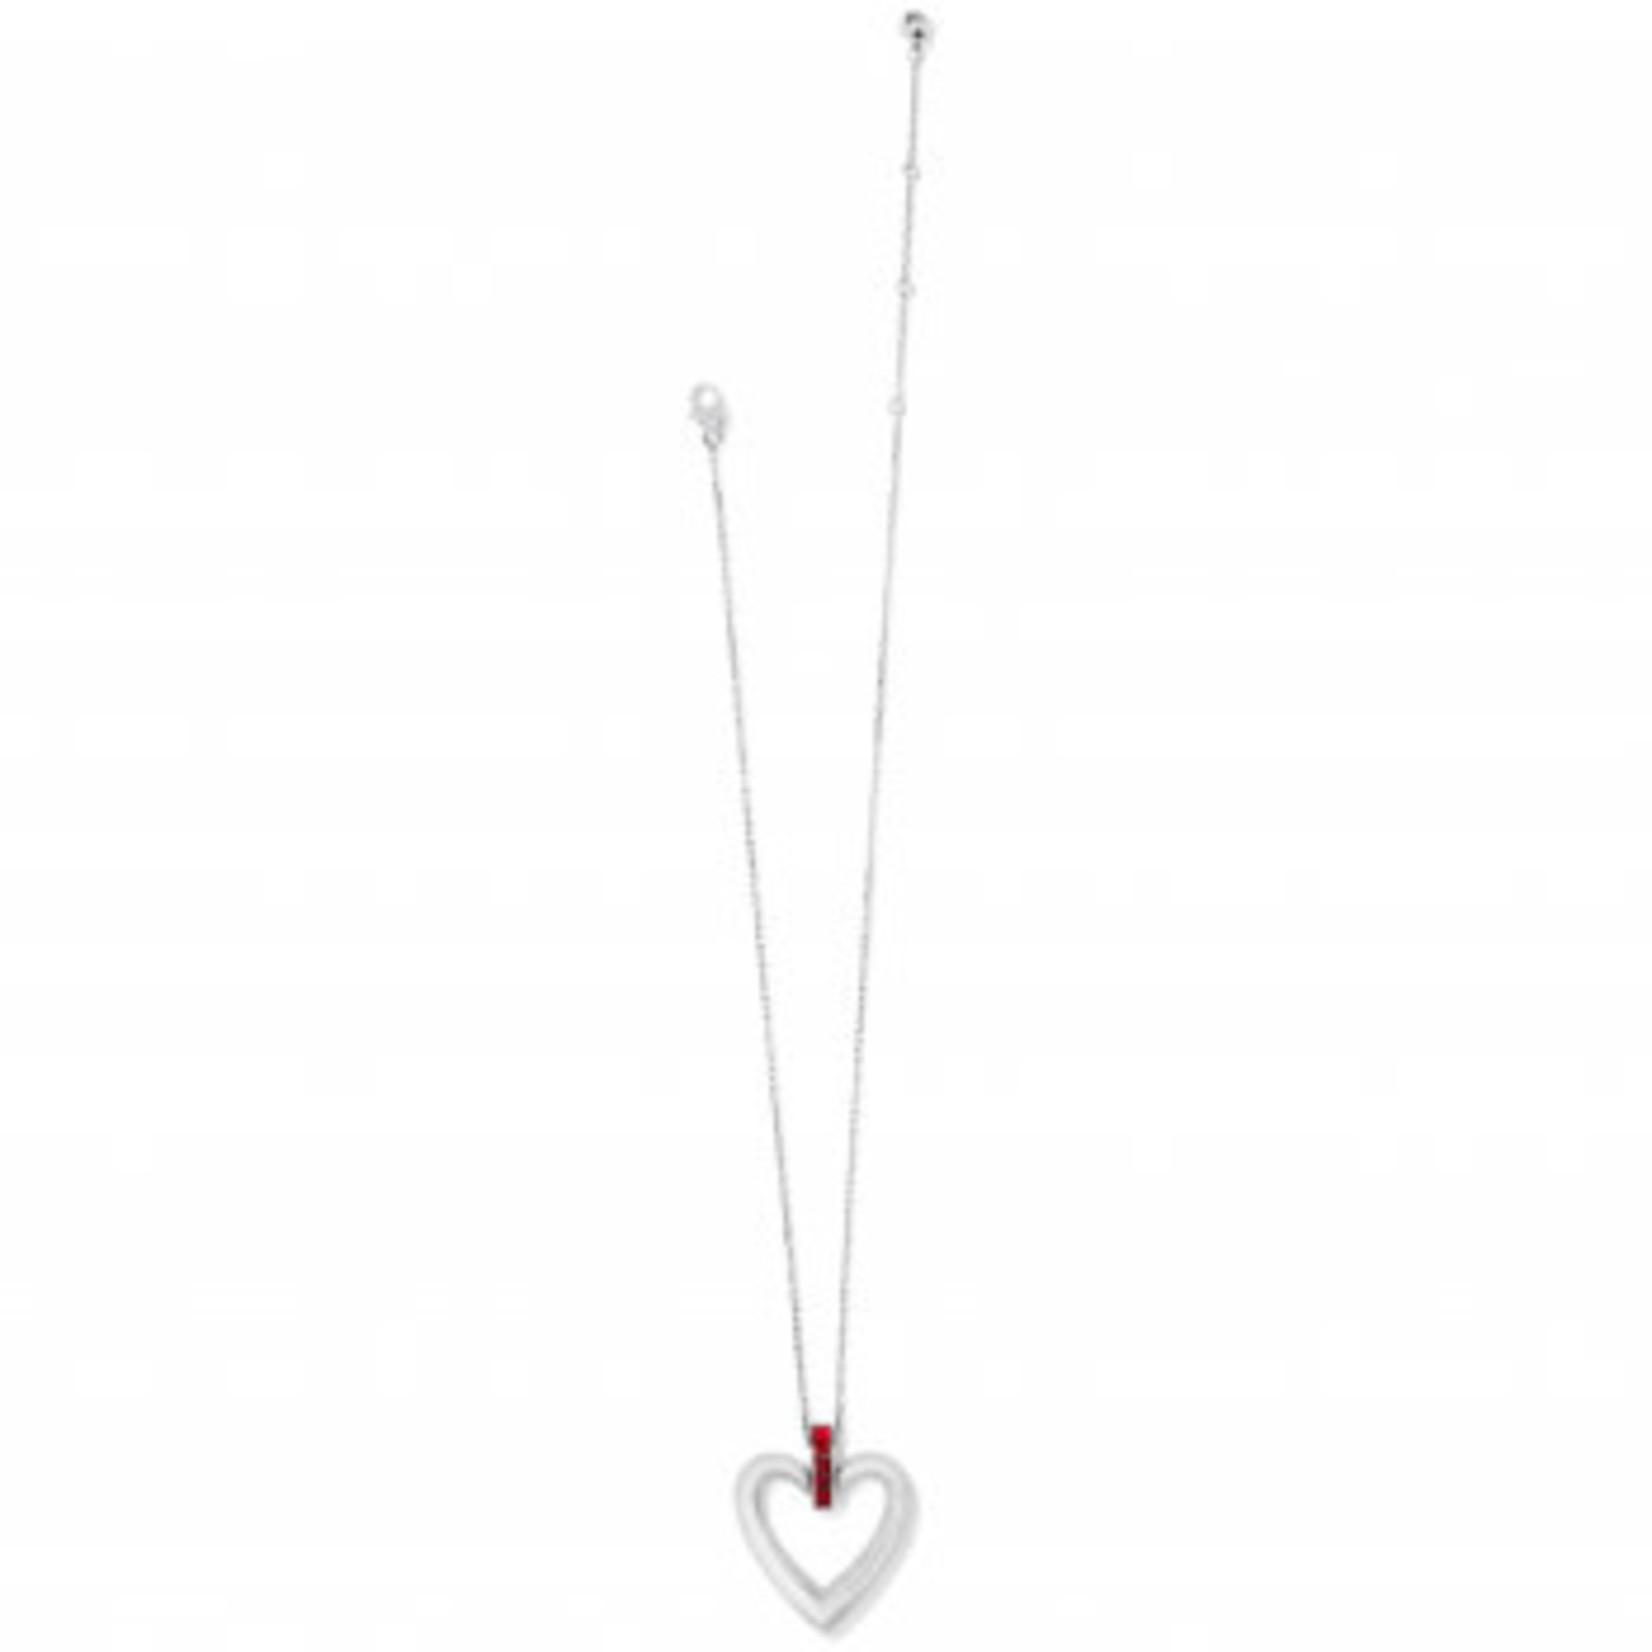 Brighton Spectrum Open Heart Necklace Silver-Red OS